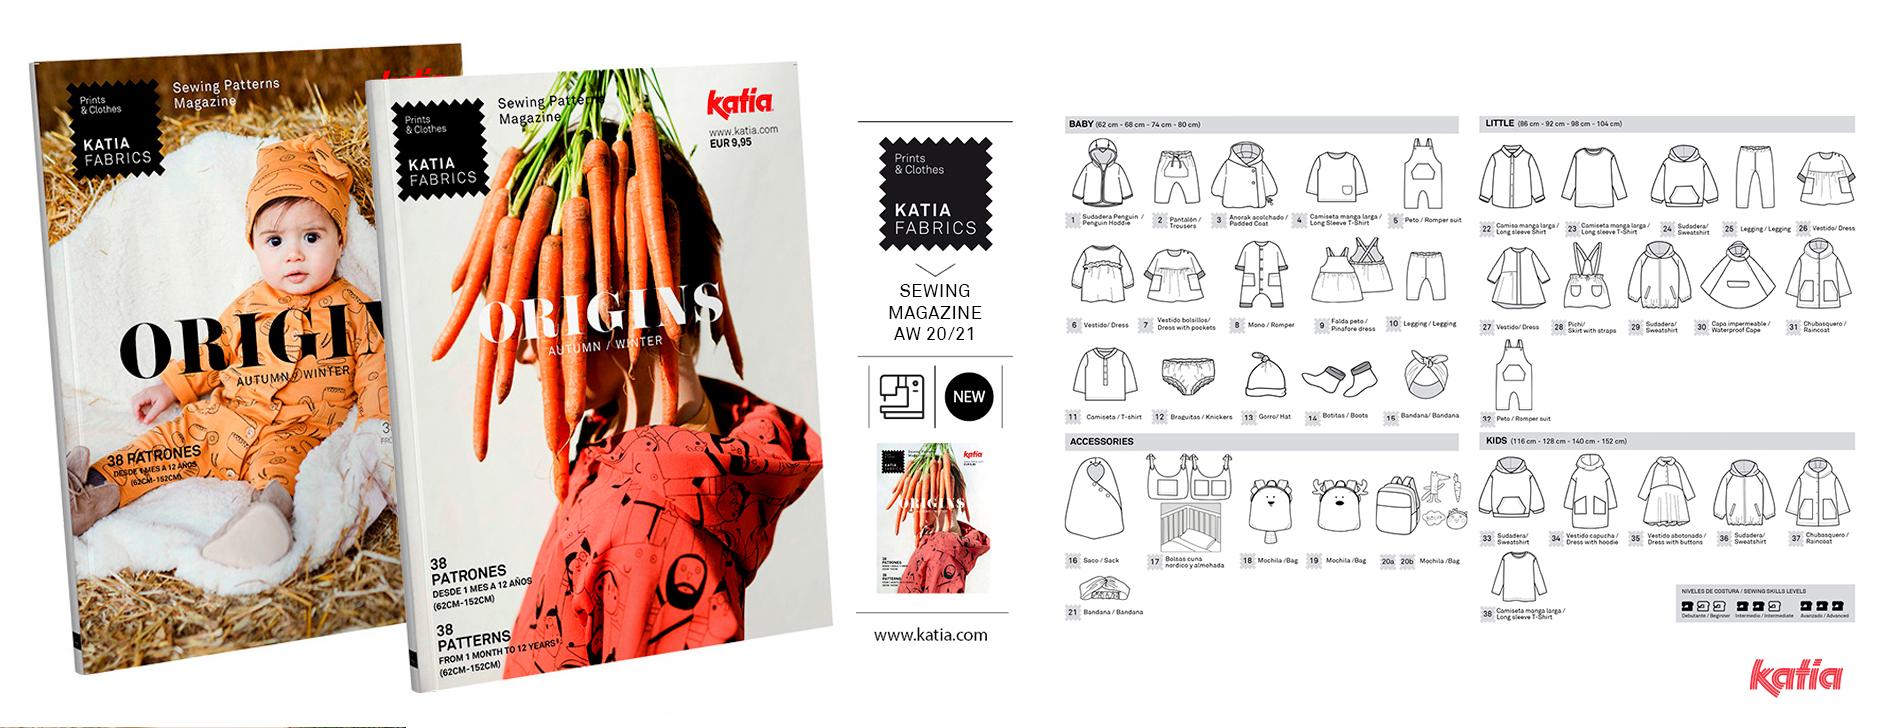 ORIGINS-Nähmagazin-Katia-Fabrics-Schnittmuster